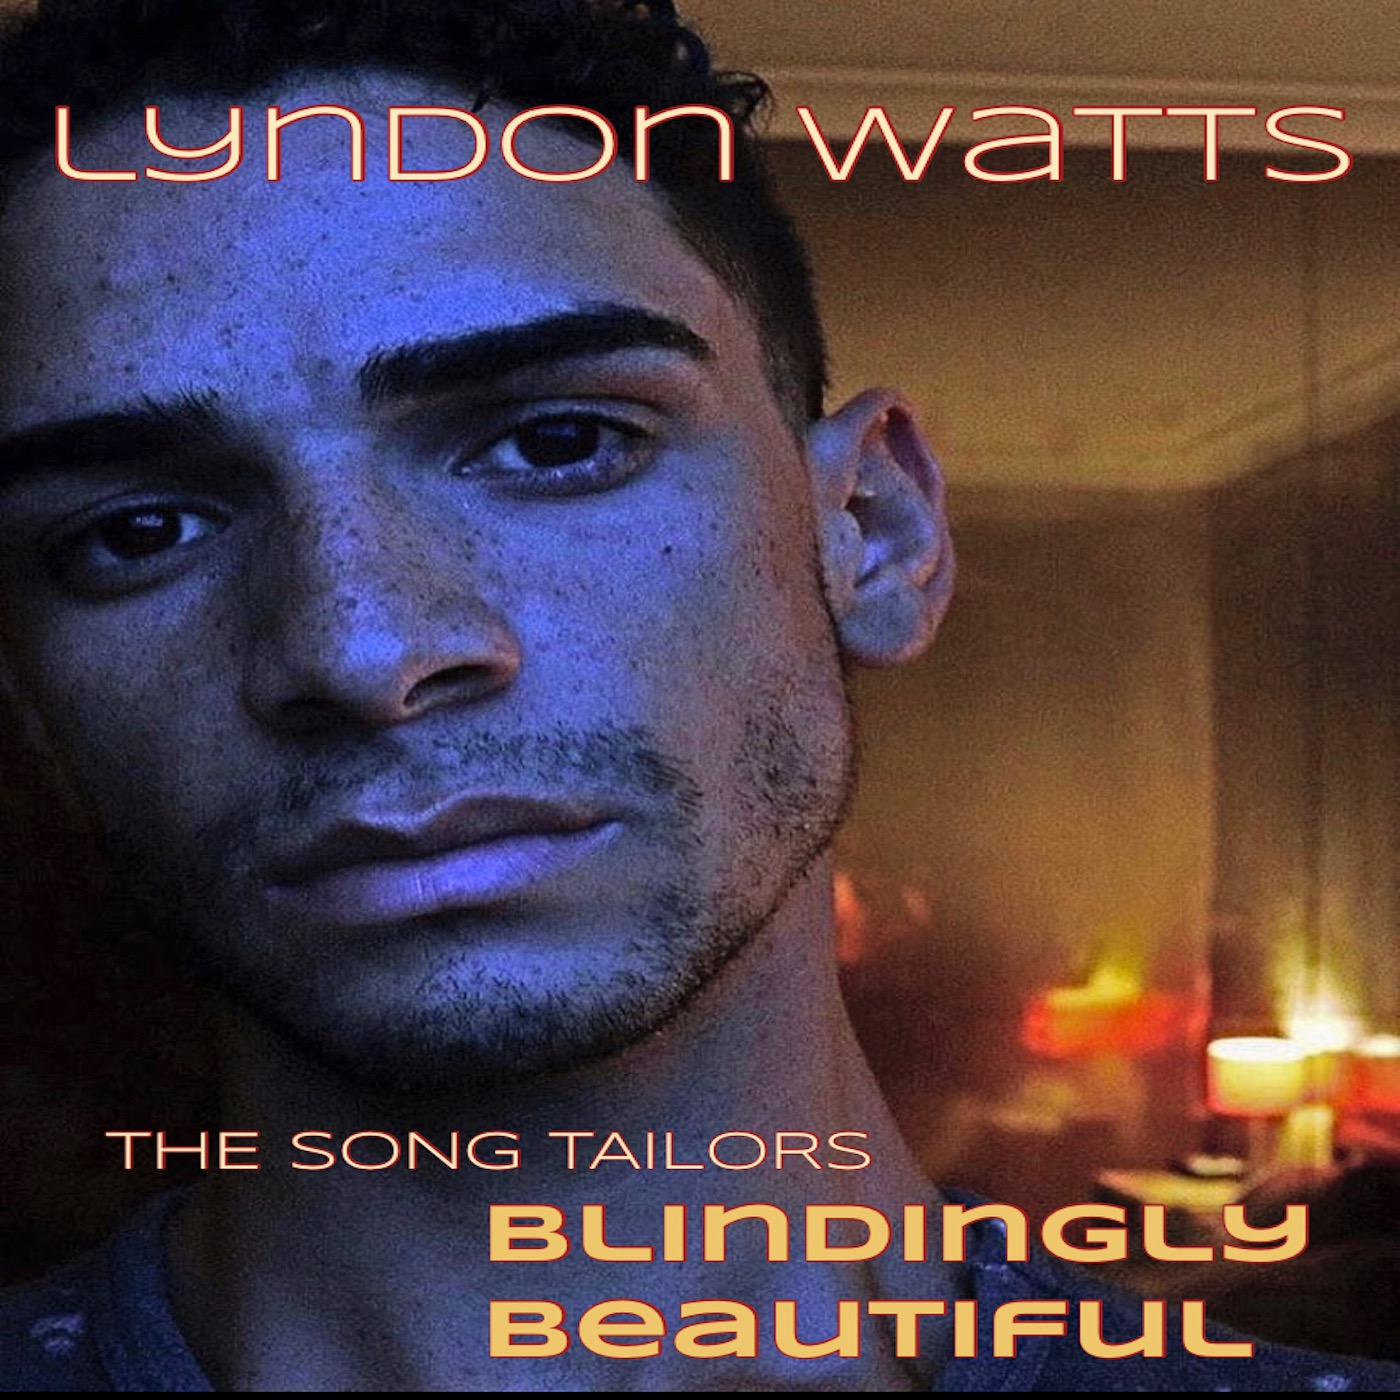 @thesongtailors Blindingly Beautiful feat. Lyndon Watts Link Thumbnail | Linktree